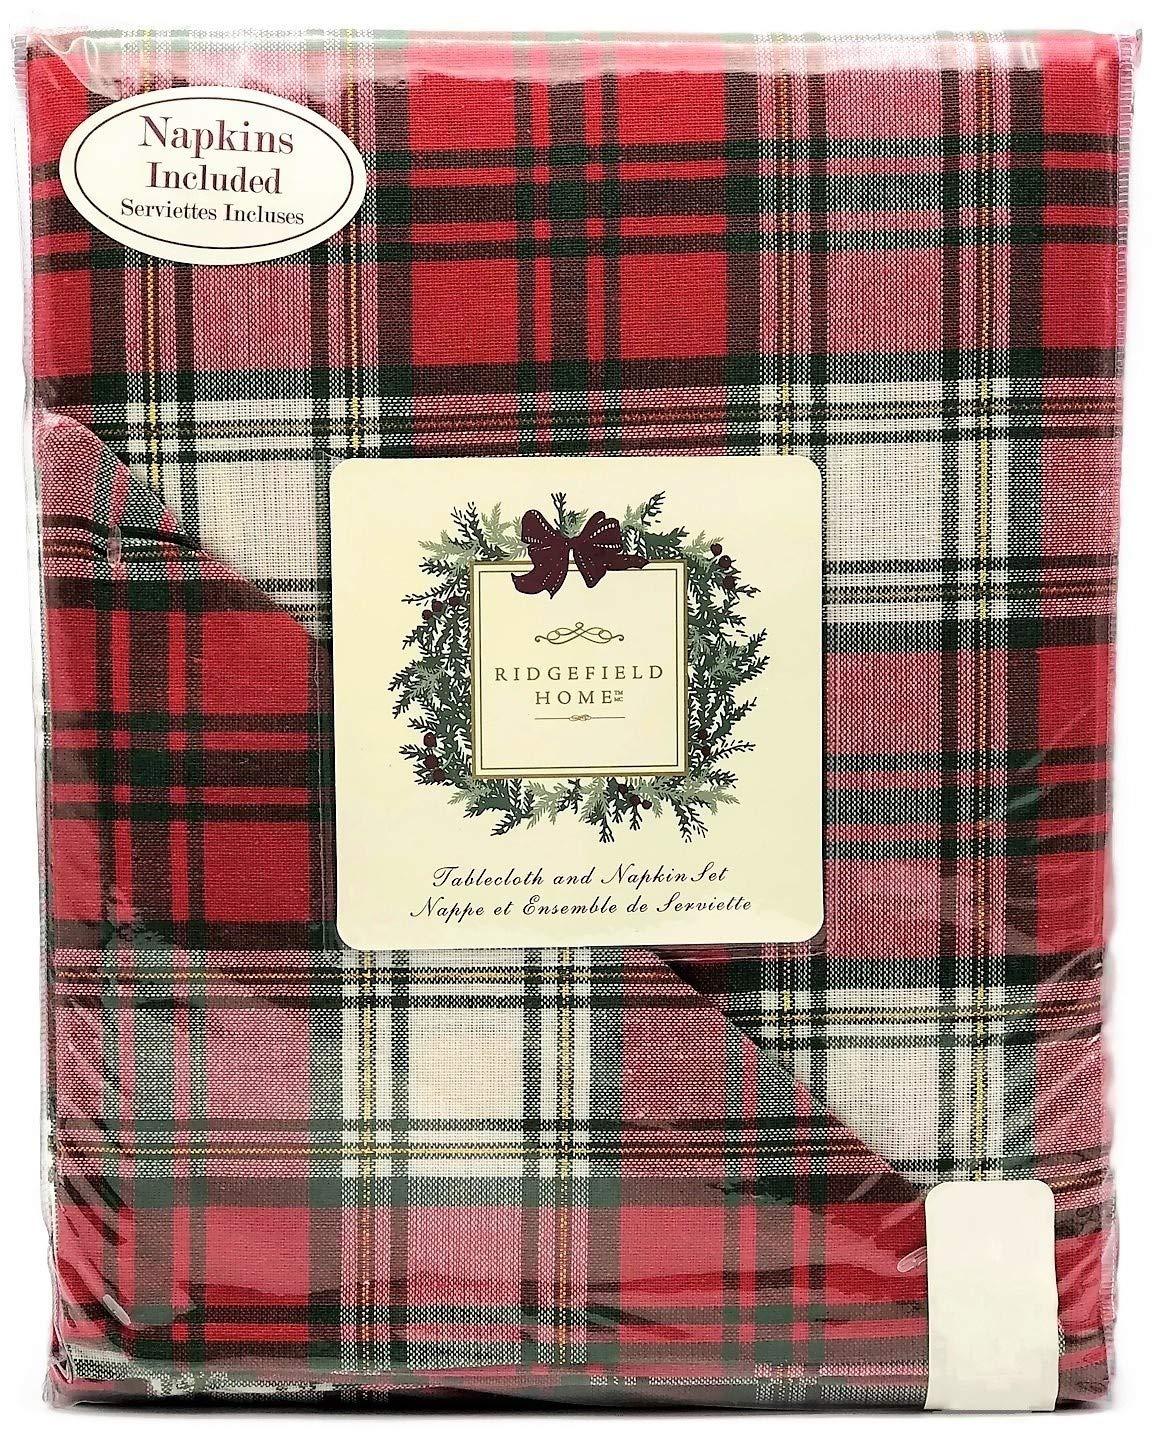 Ridgefield Home クリスマスレッドグリーン格子柄ホリデーコットンテーブルクロス ディナーナプキンセット 60